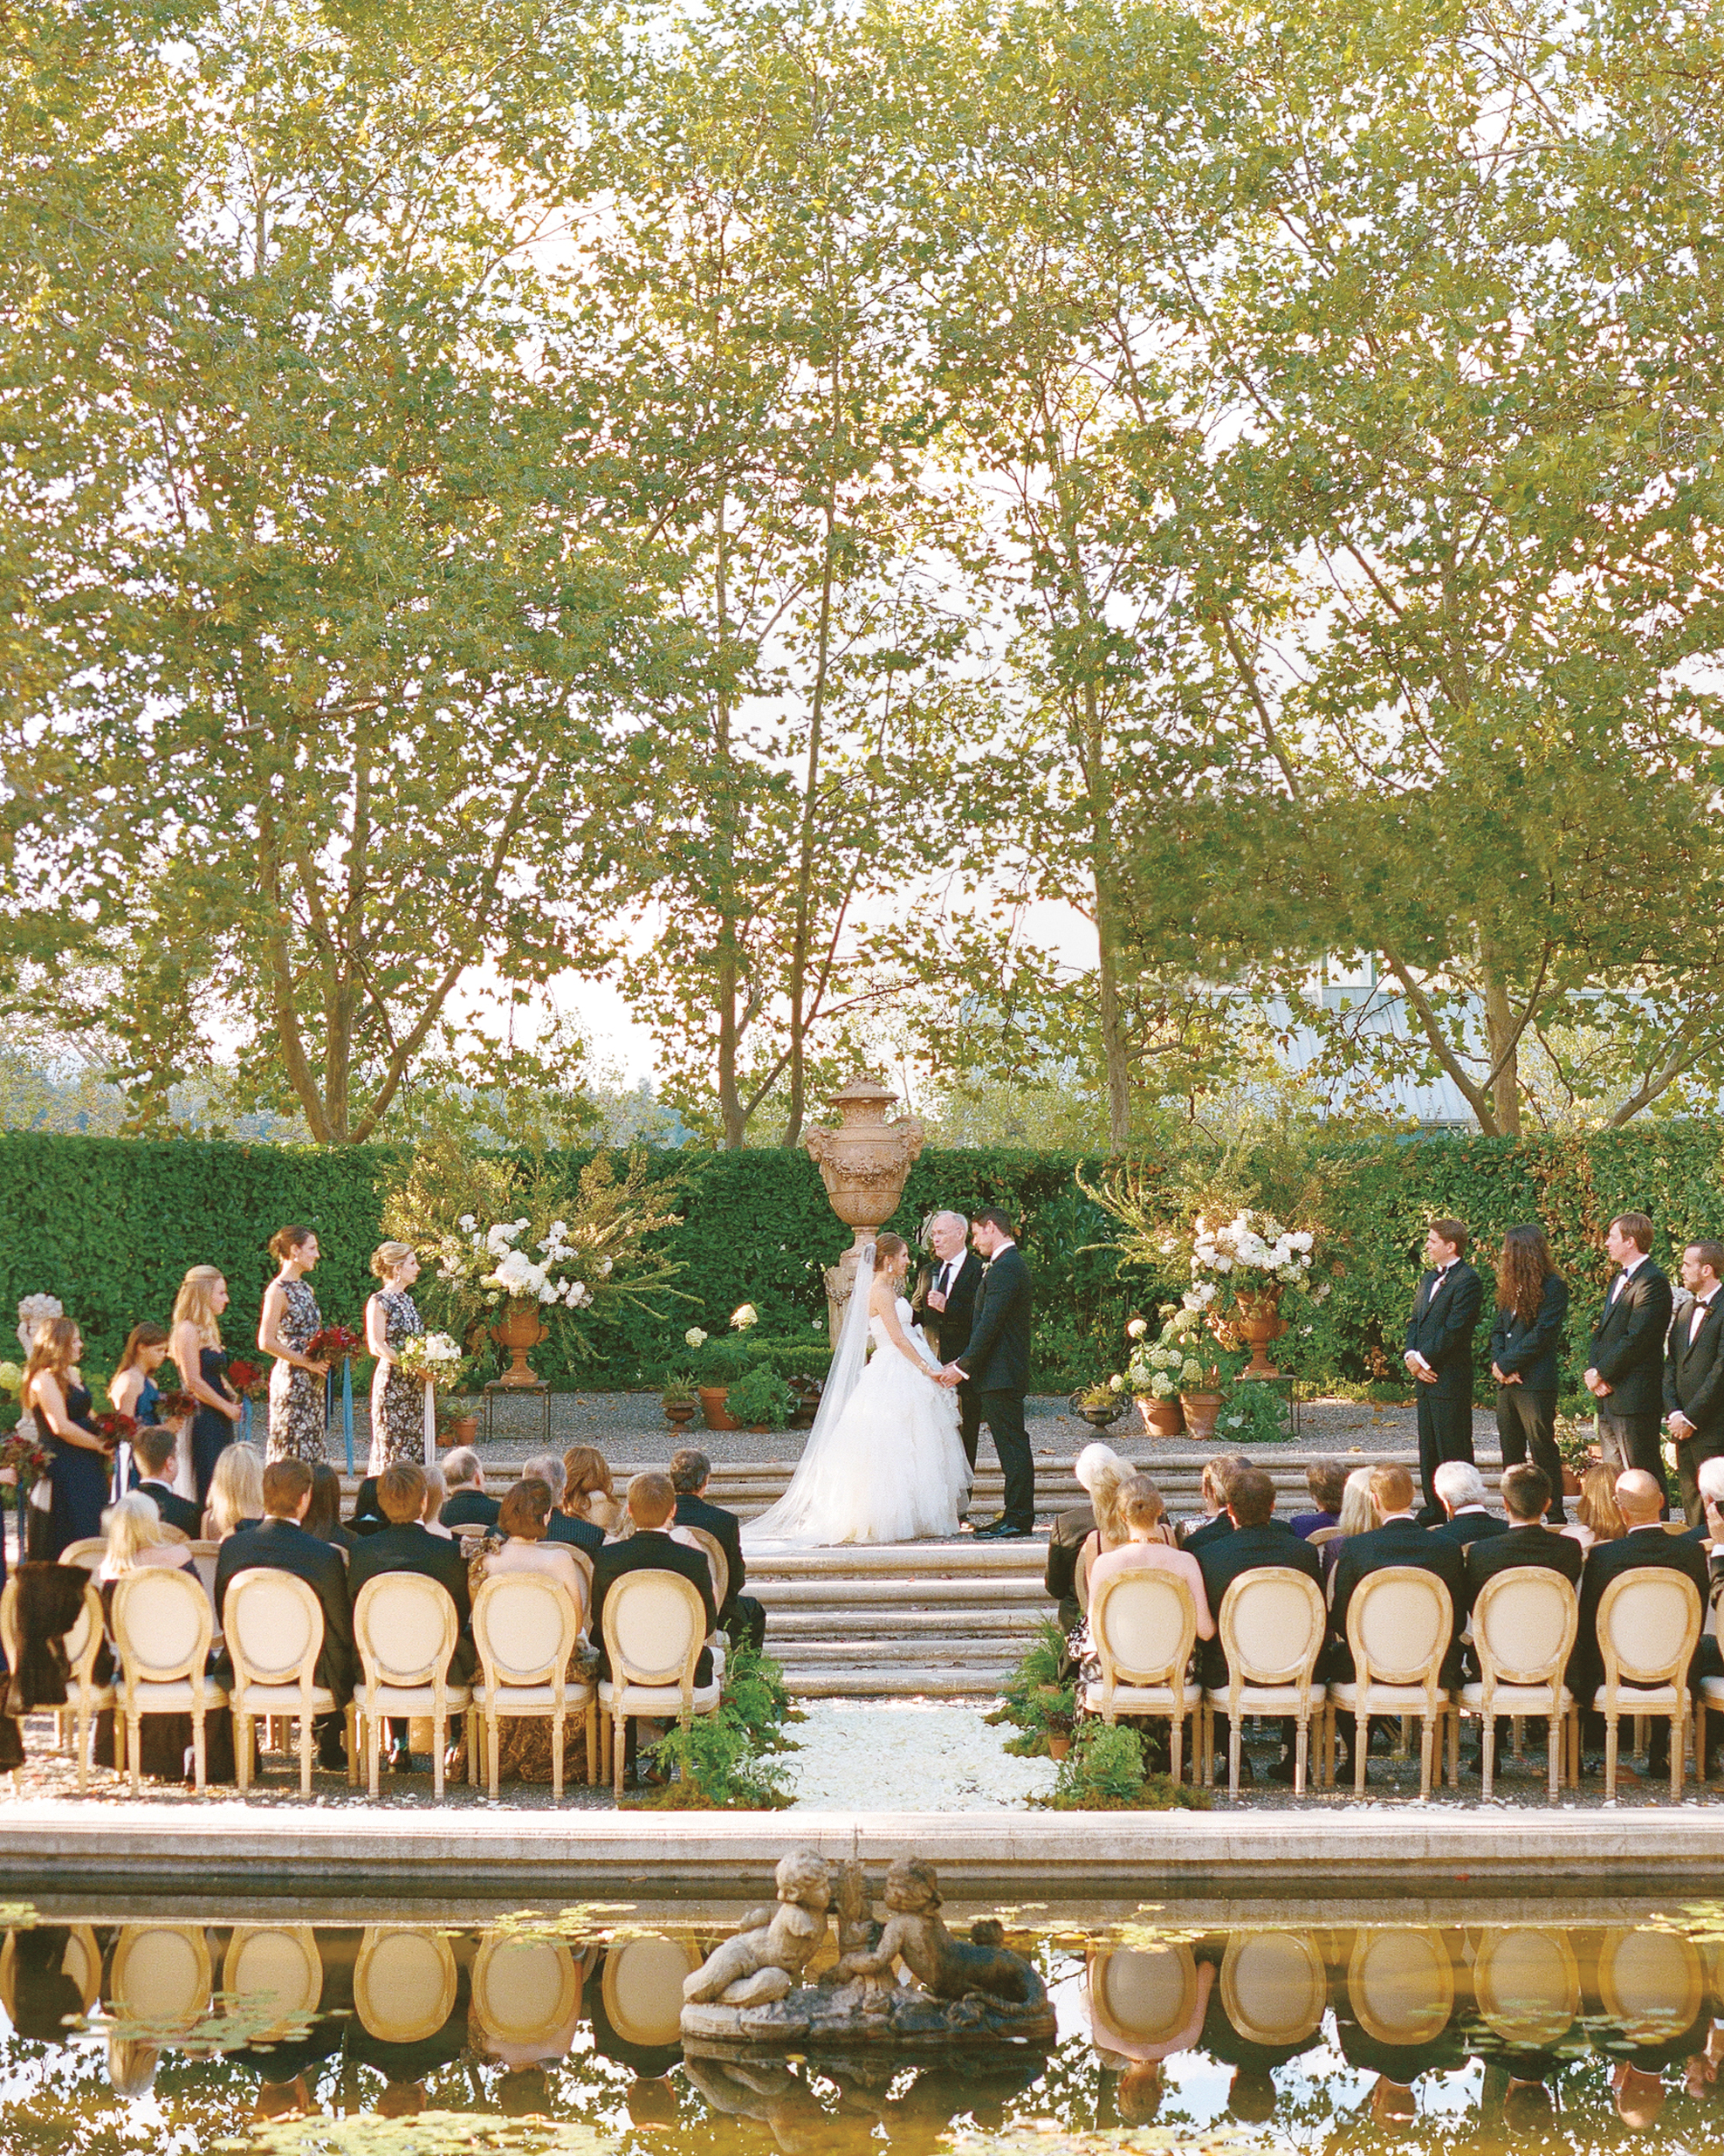 nicole-bradley-napa-california-wedding-1654-s112349.jpg